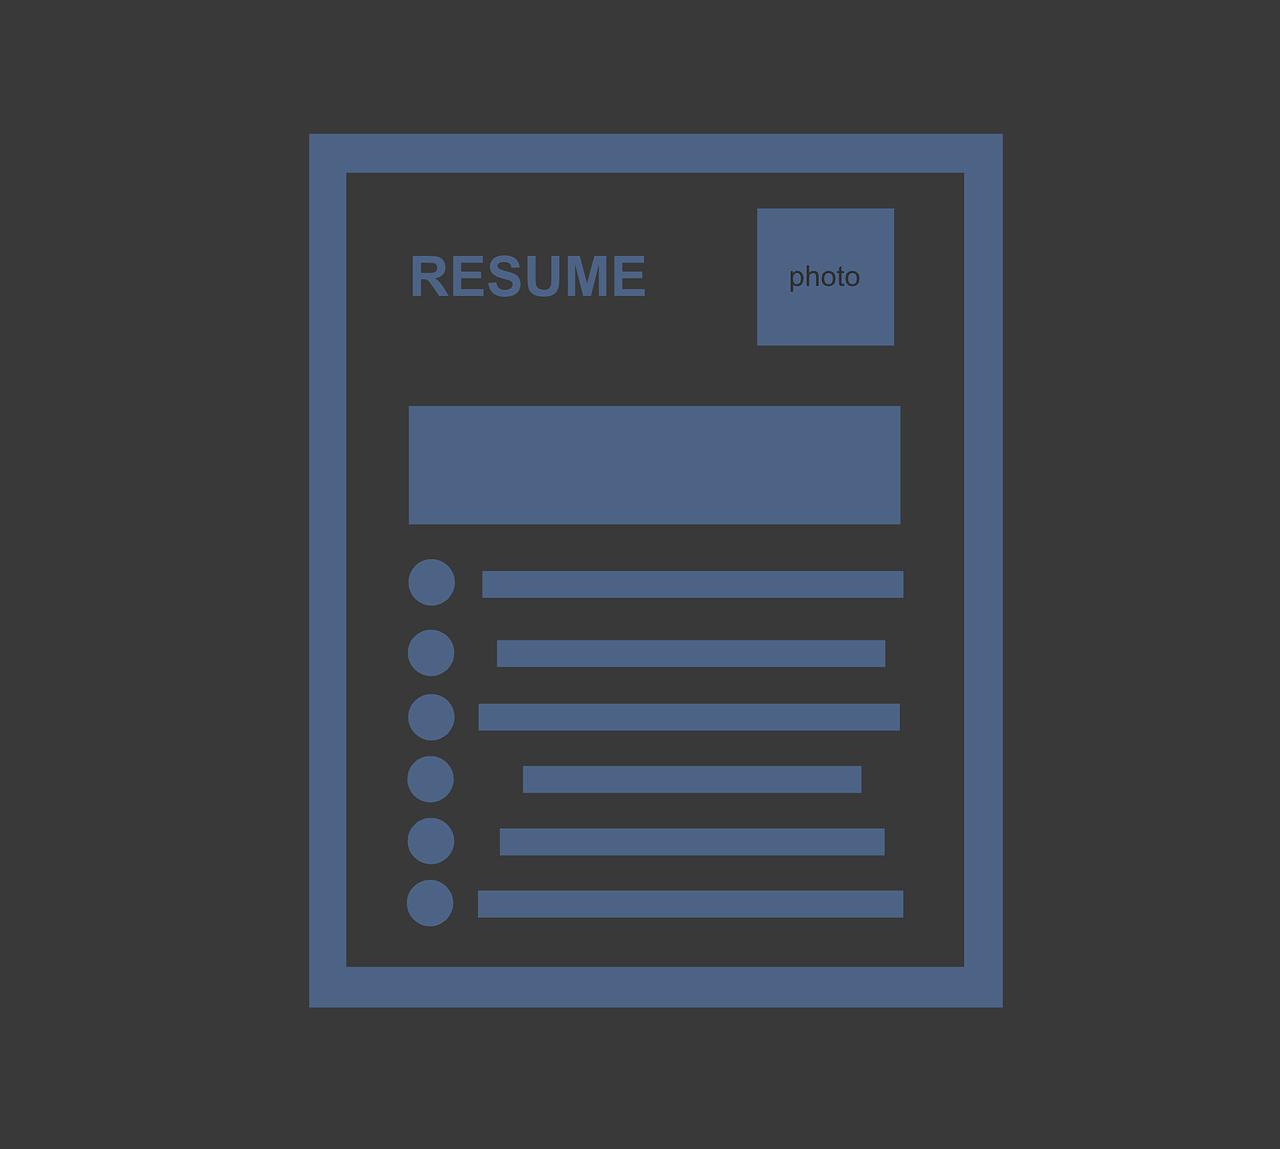 resume1799952_1280